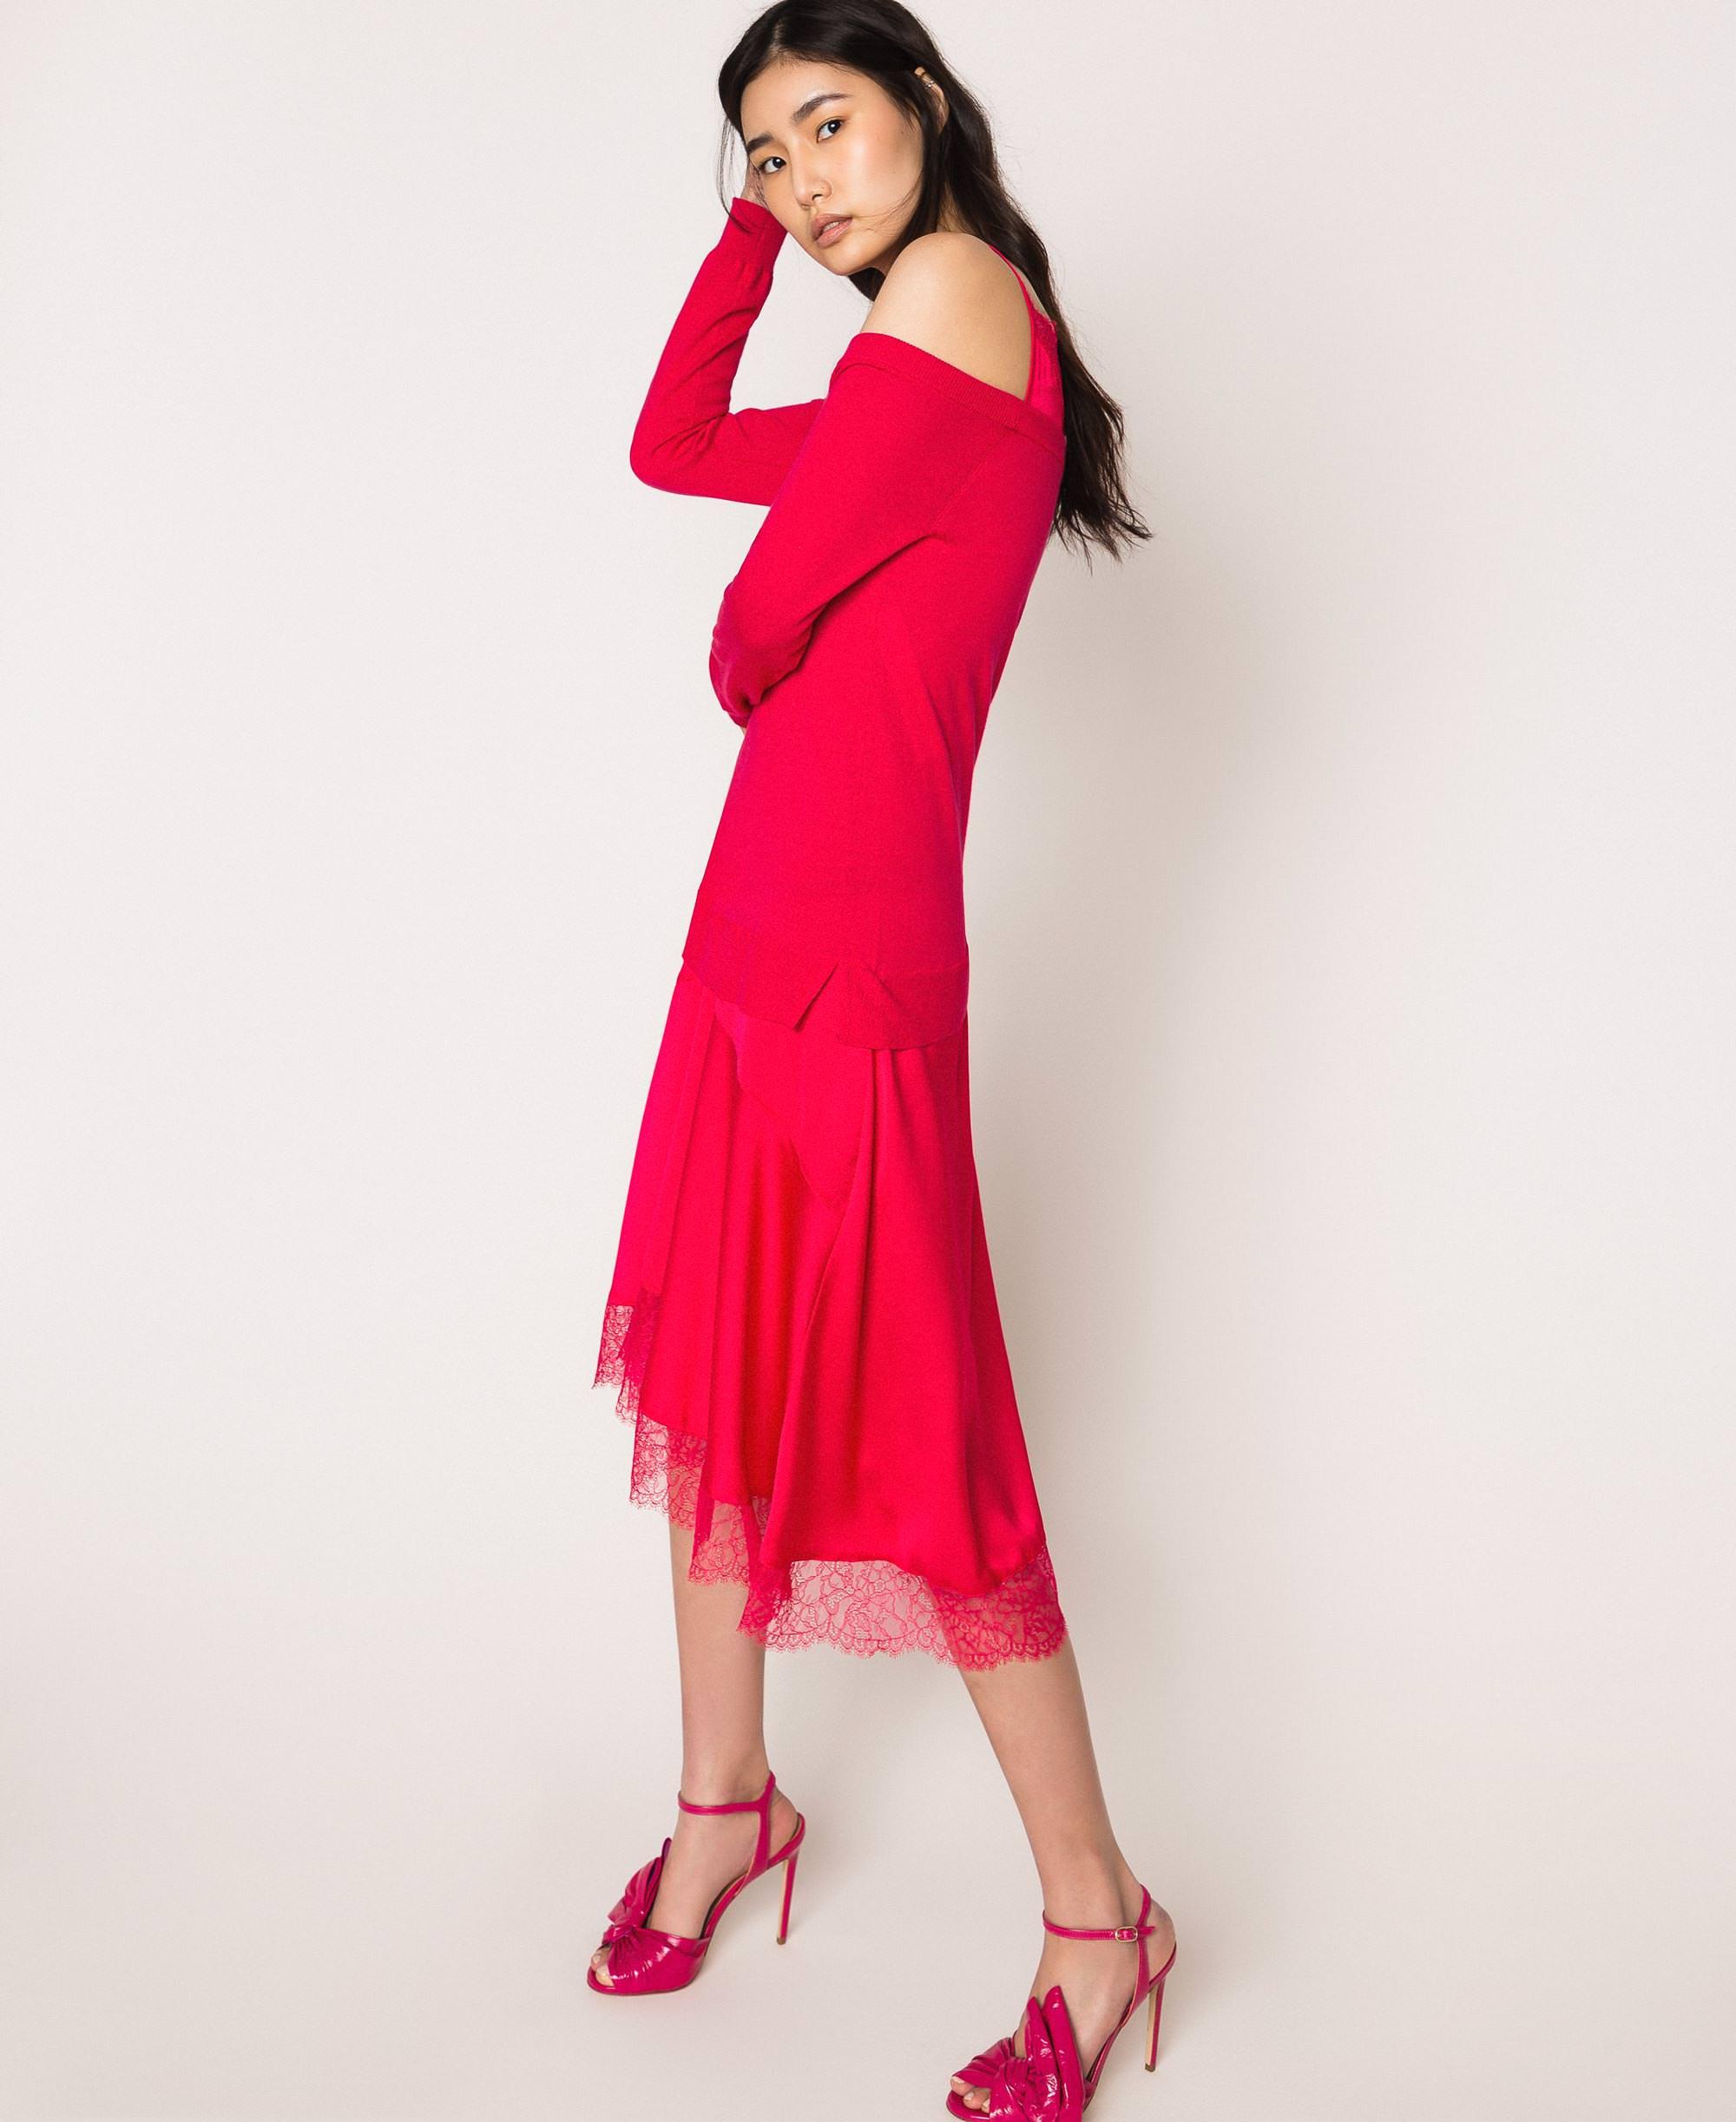 Robe En Maille De Satin Style Nuisette Femme Rouge Twinset Milano